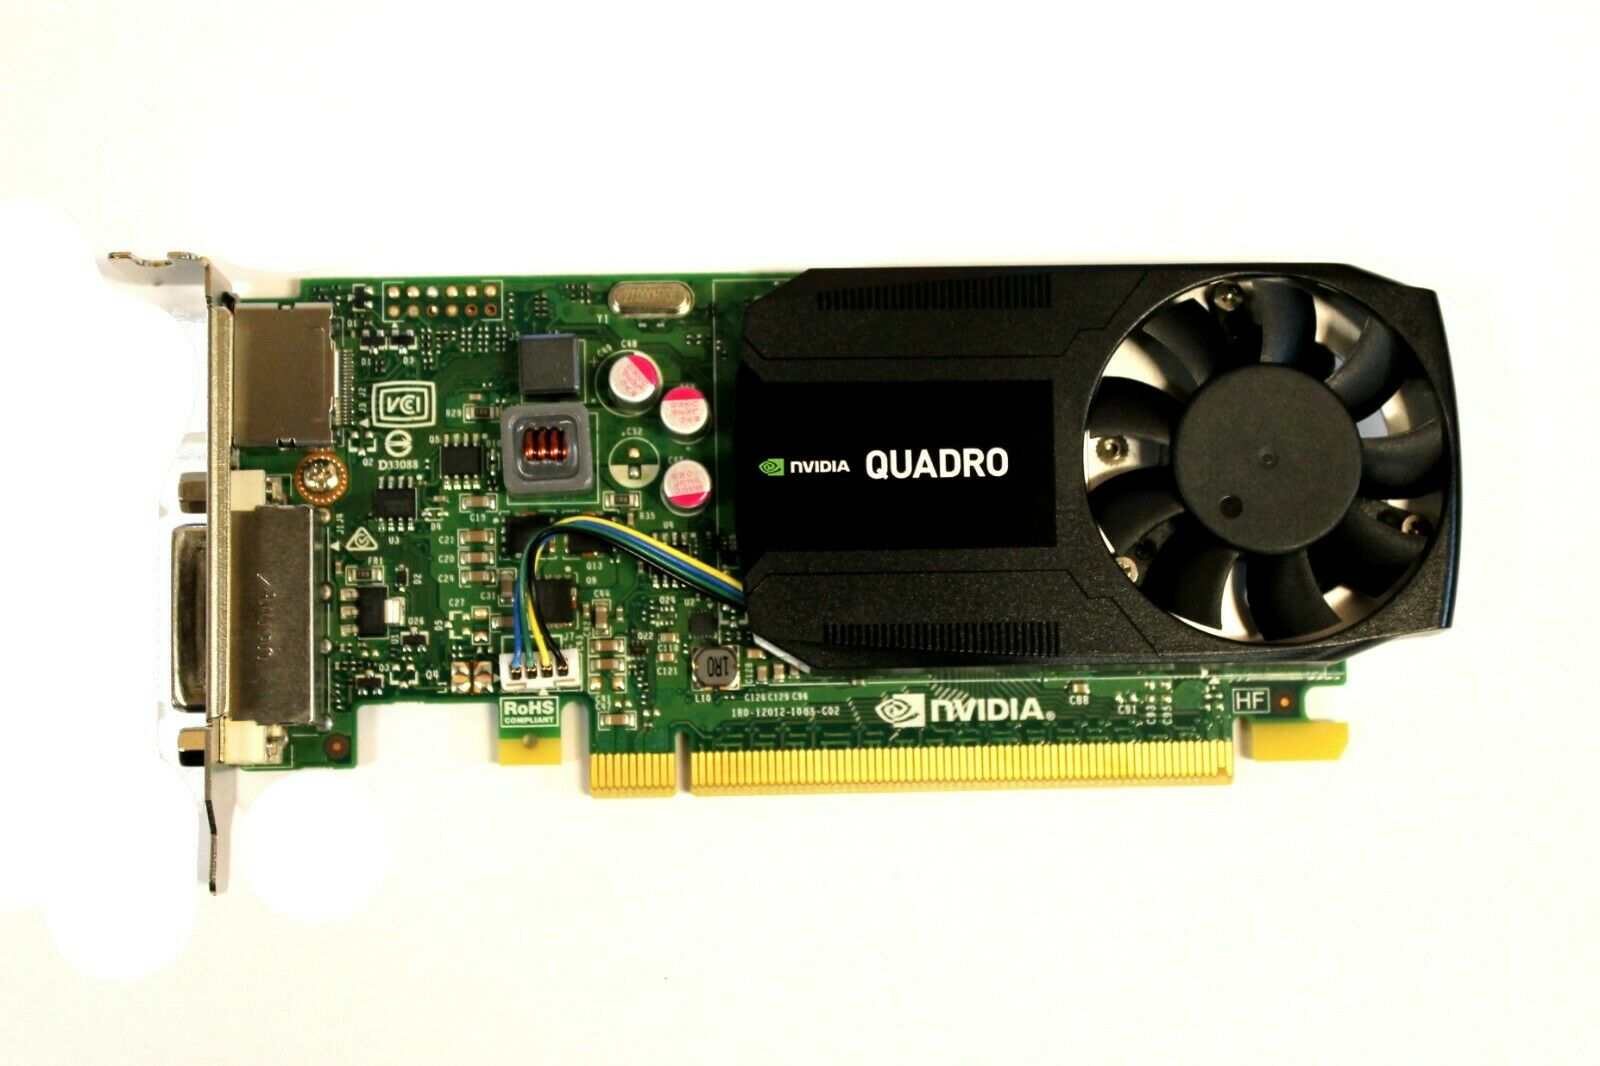 379T0 Dell Nvidia Quadro K620 2GB DDR3 Pci-E 2.0 x16 Video Grafikkarte